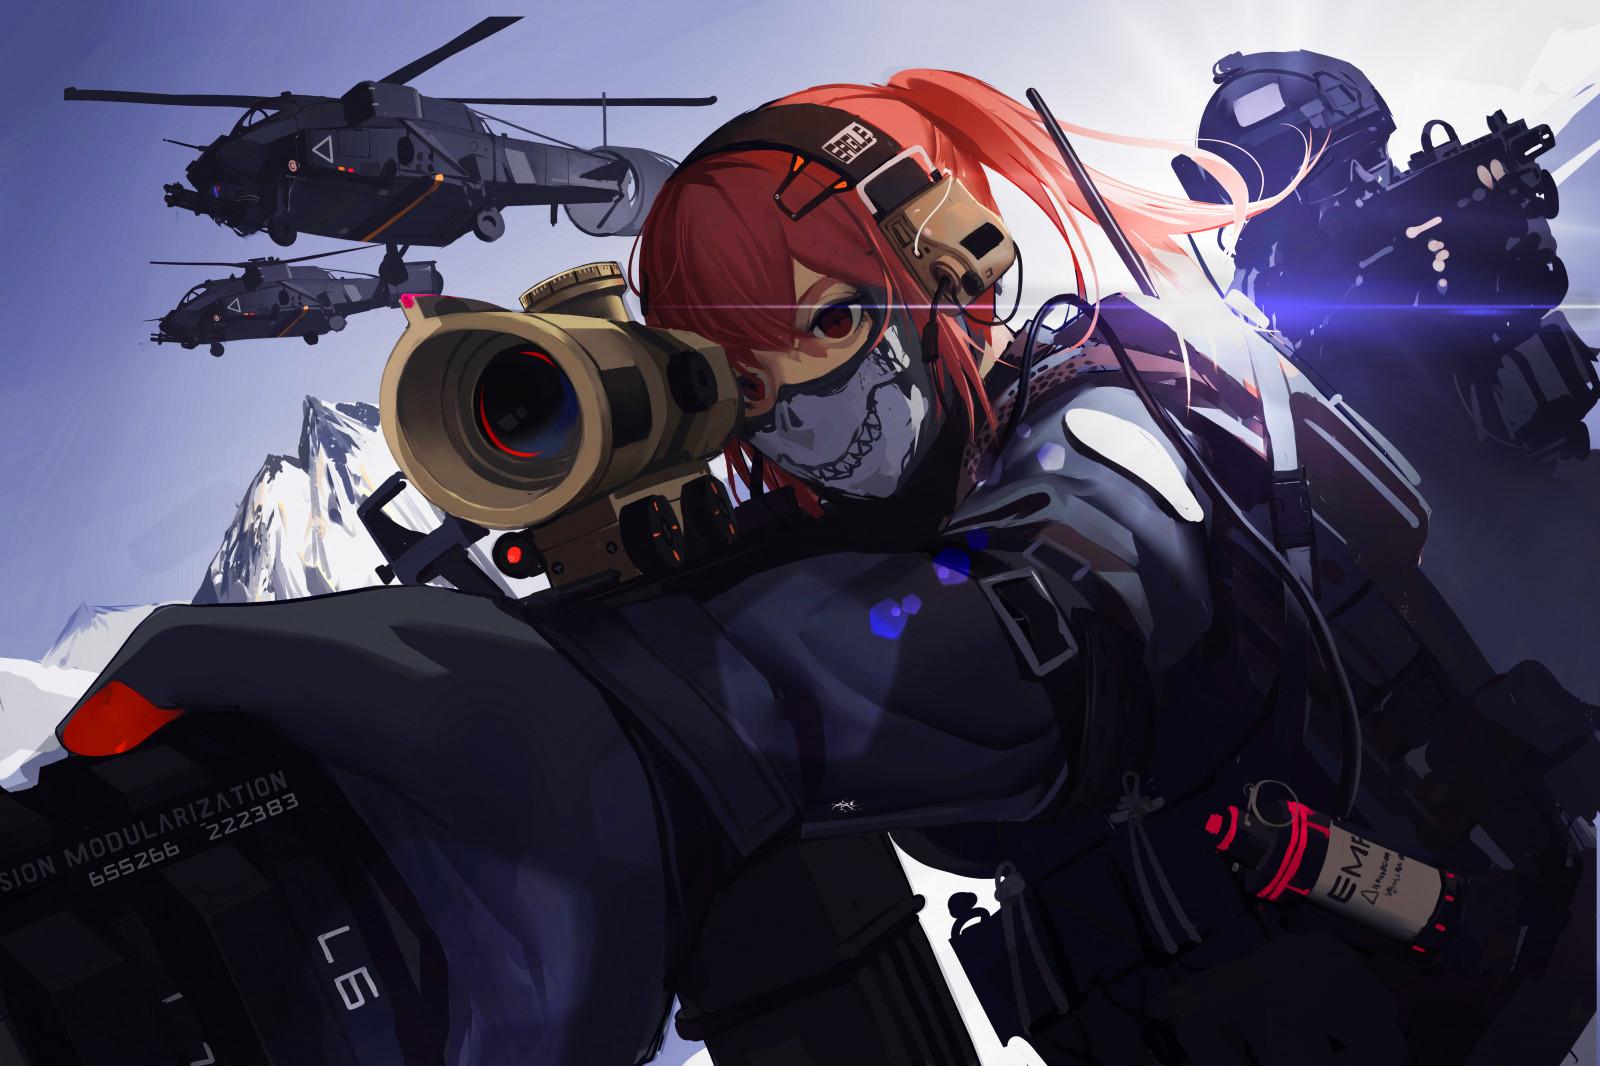 Wallpaper military china weapon soldier anime girls - Anime war wallpaper ...